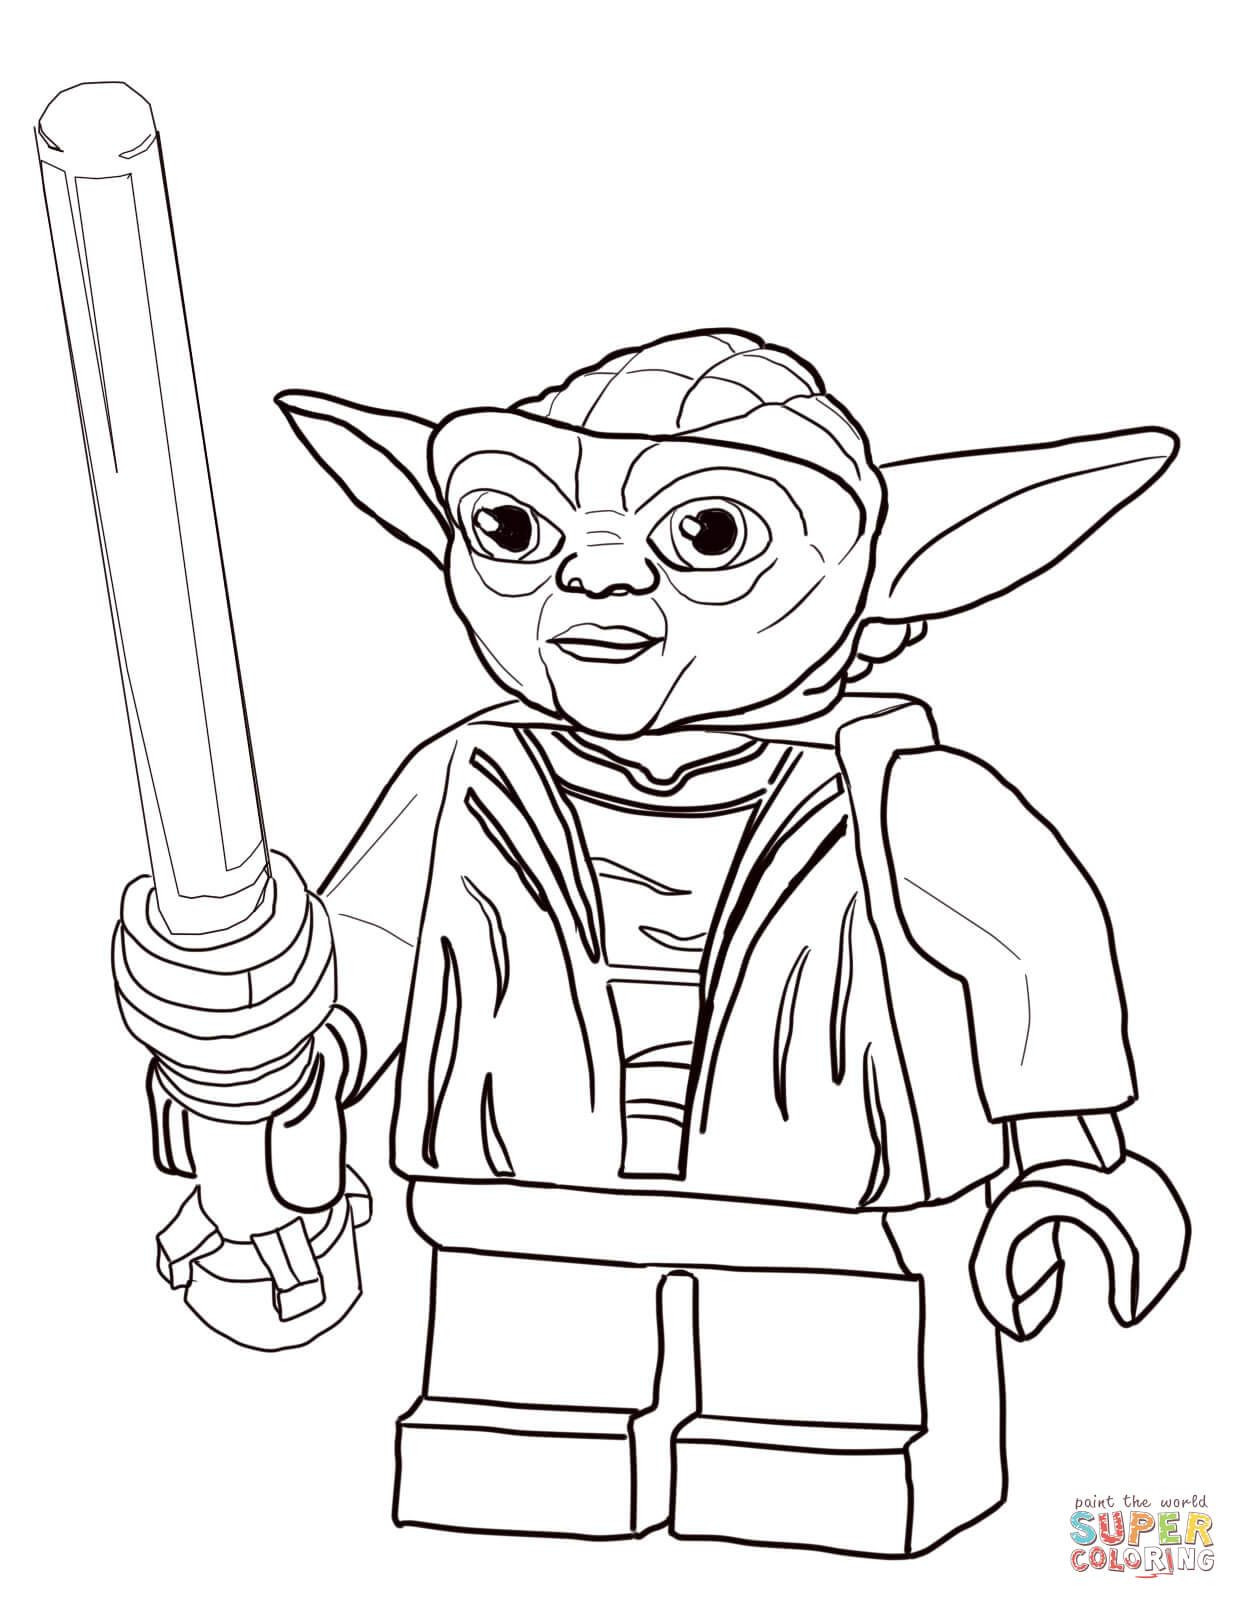 Star Wars Christmas Coloring Pages  Lego Star Wars Master Yoda Super Coloring